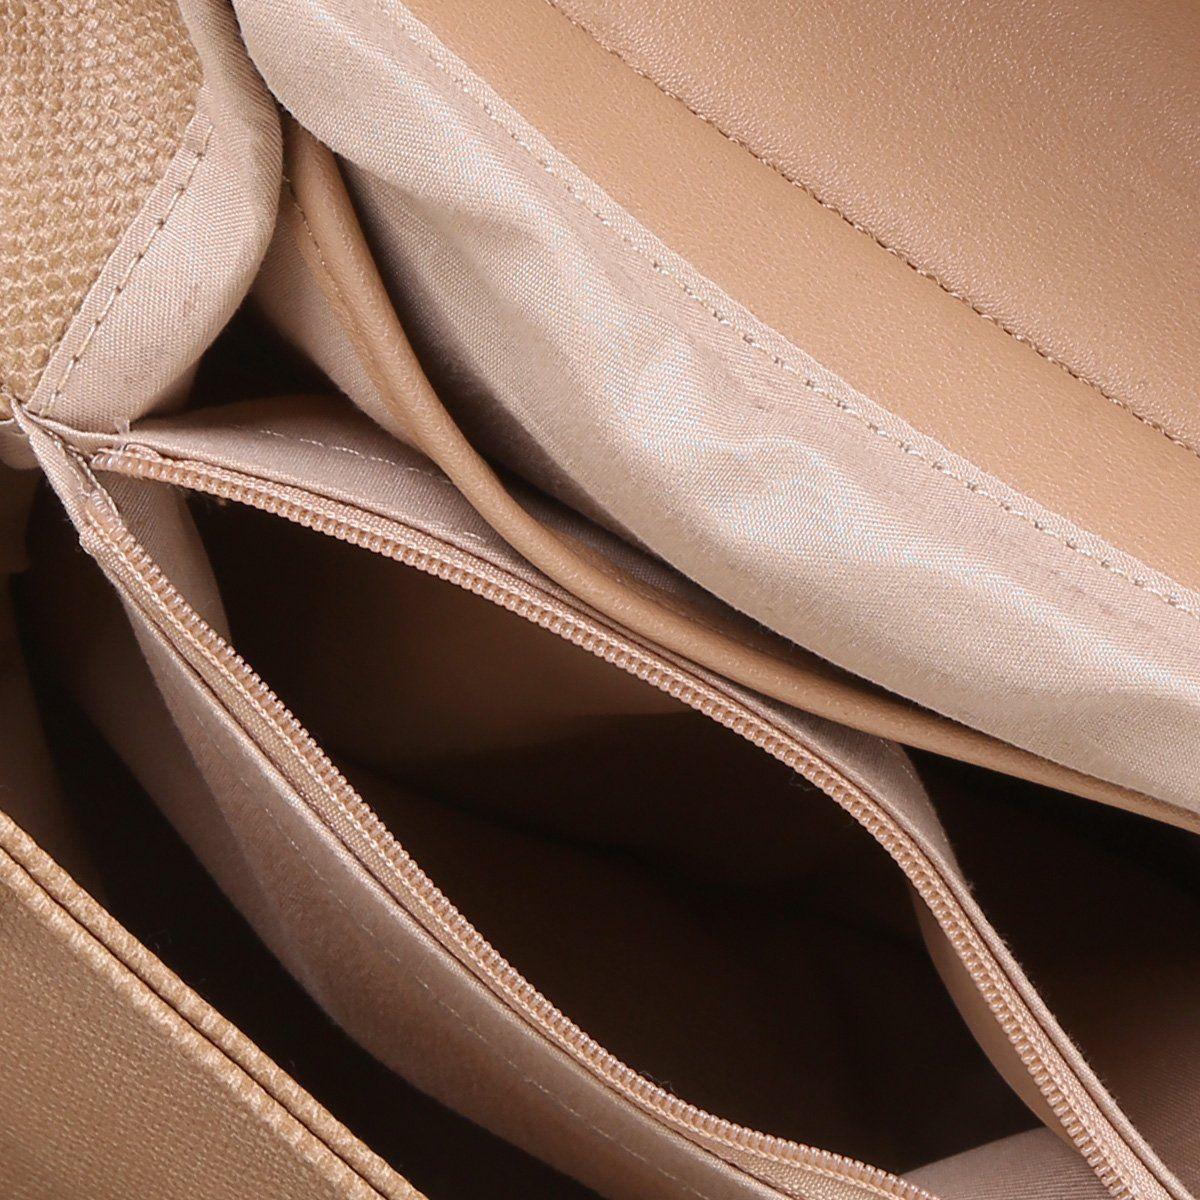 a5fd63caa Bolsa Shoestock Satchel Média Textura Feminina - Compre Agora ...